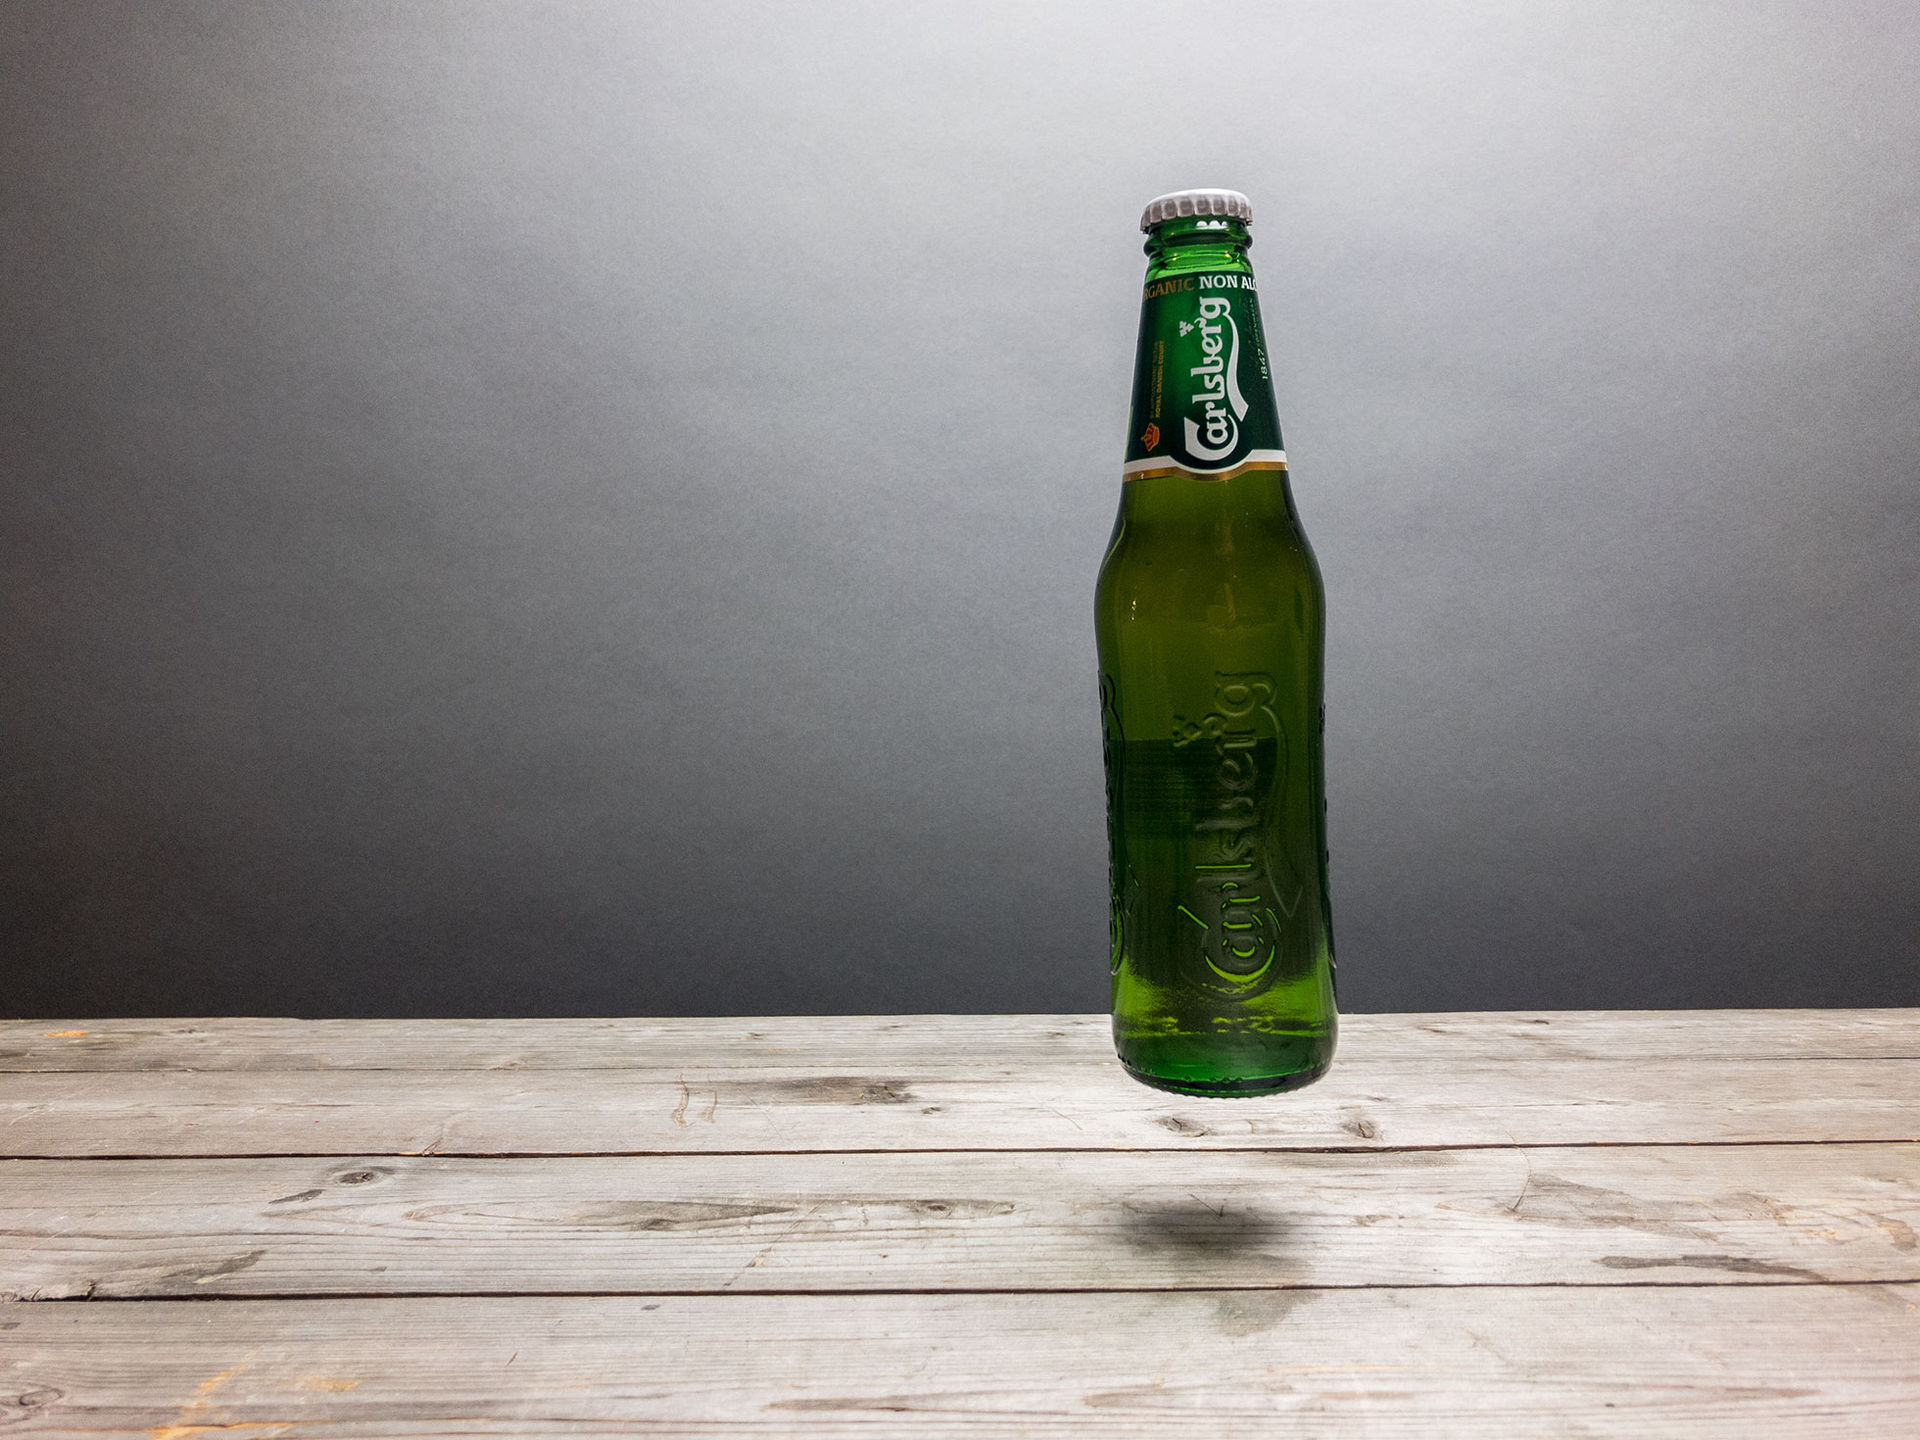 Carlsberg gör även alkofri öl ekologisk